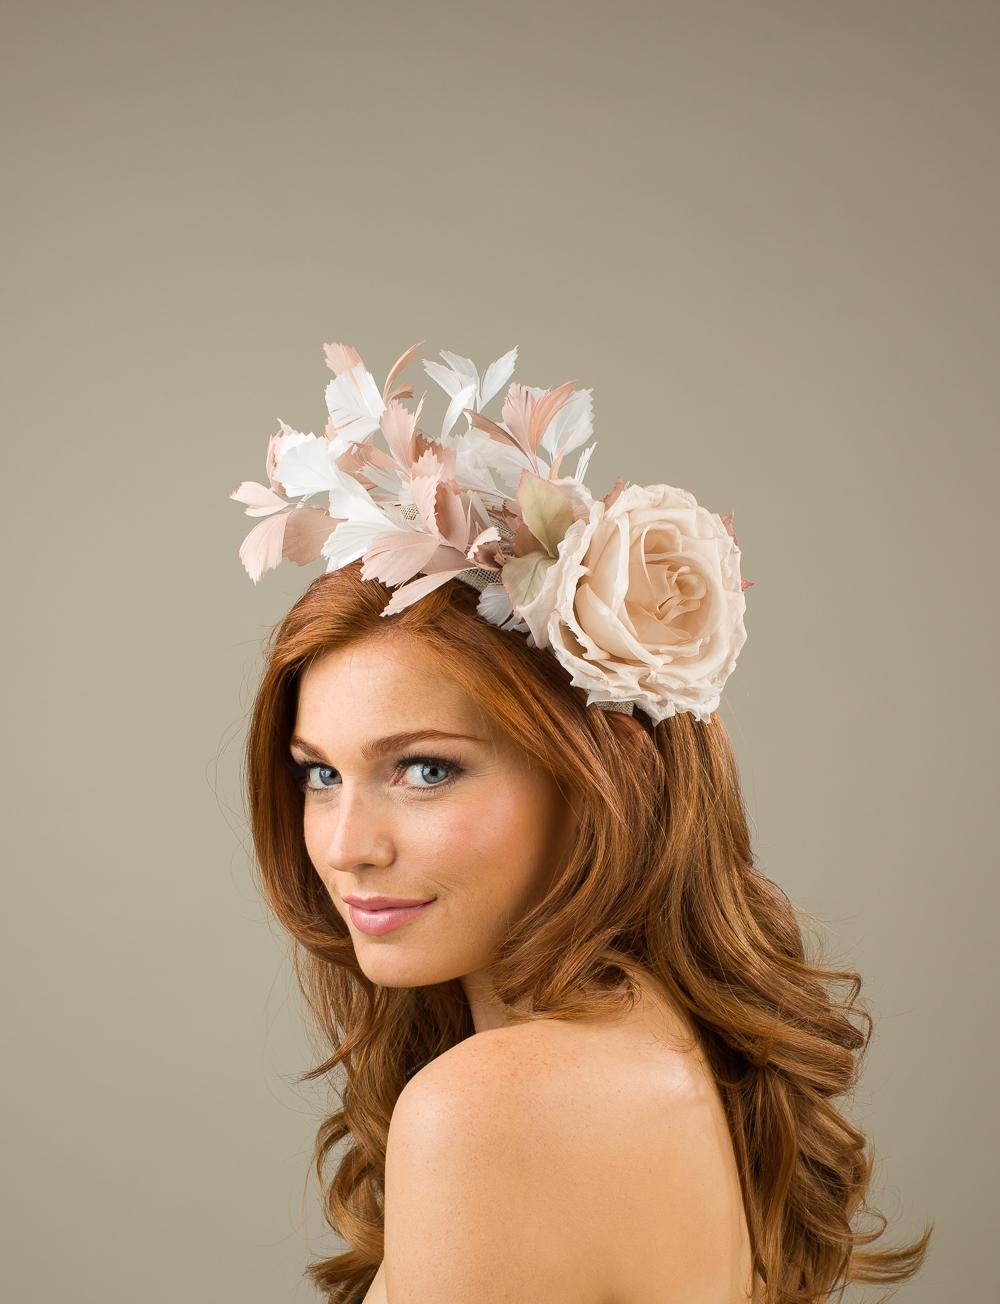 Toward headband